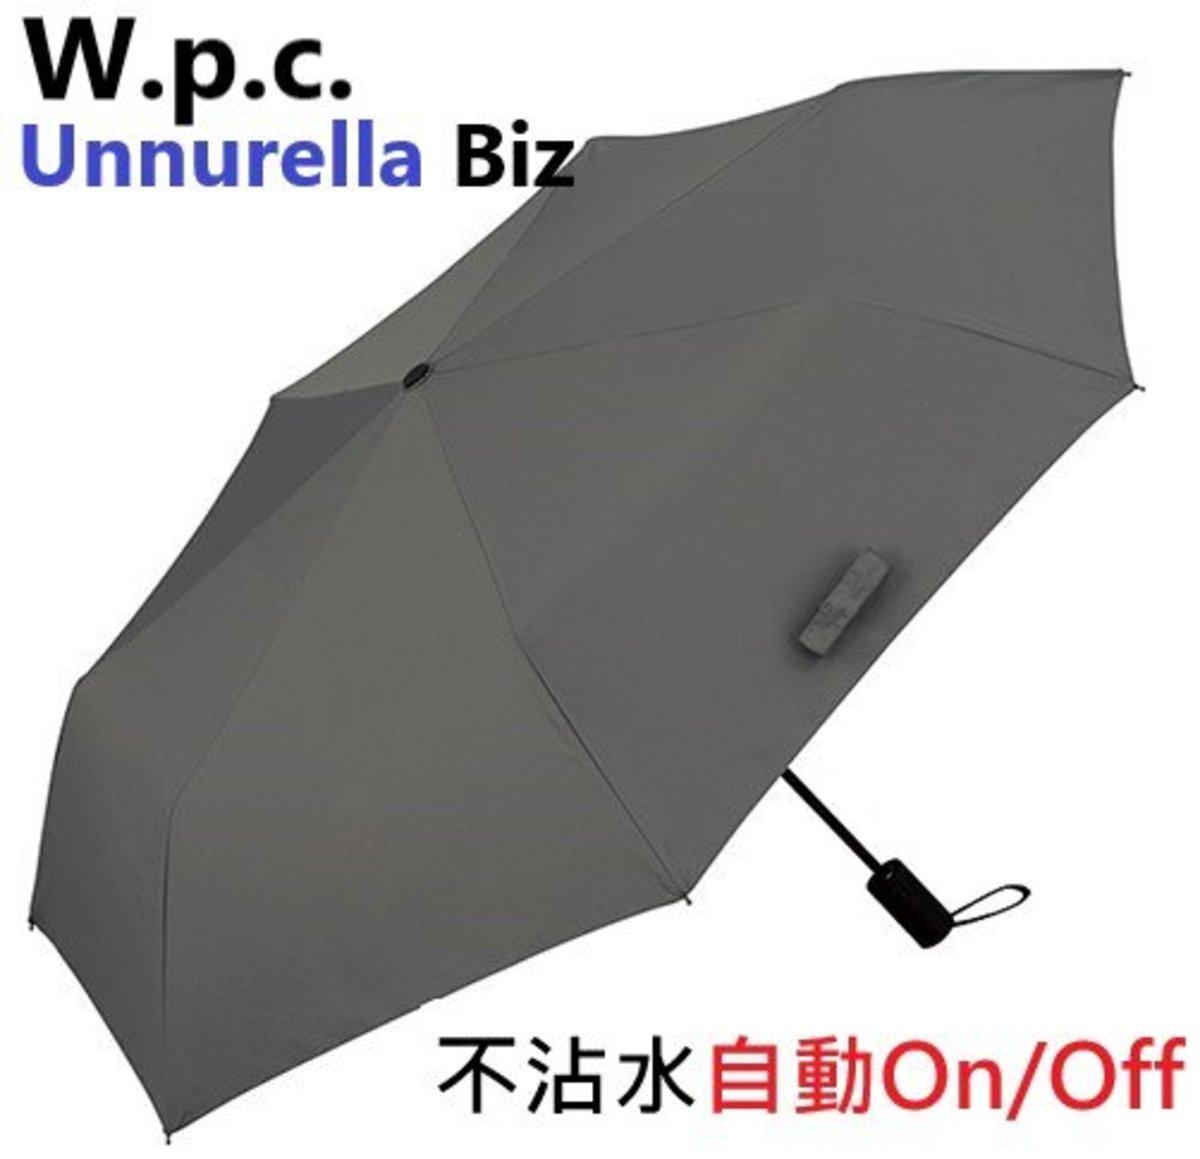 (UN-104) 灰色 - Unnurella Biz日本瞬間速乾滴水不沾摺雨傘【自動開關款】